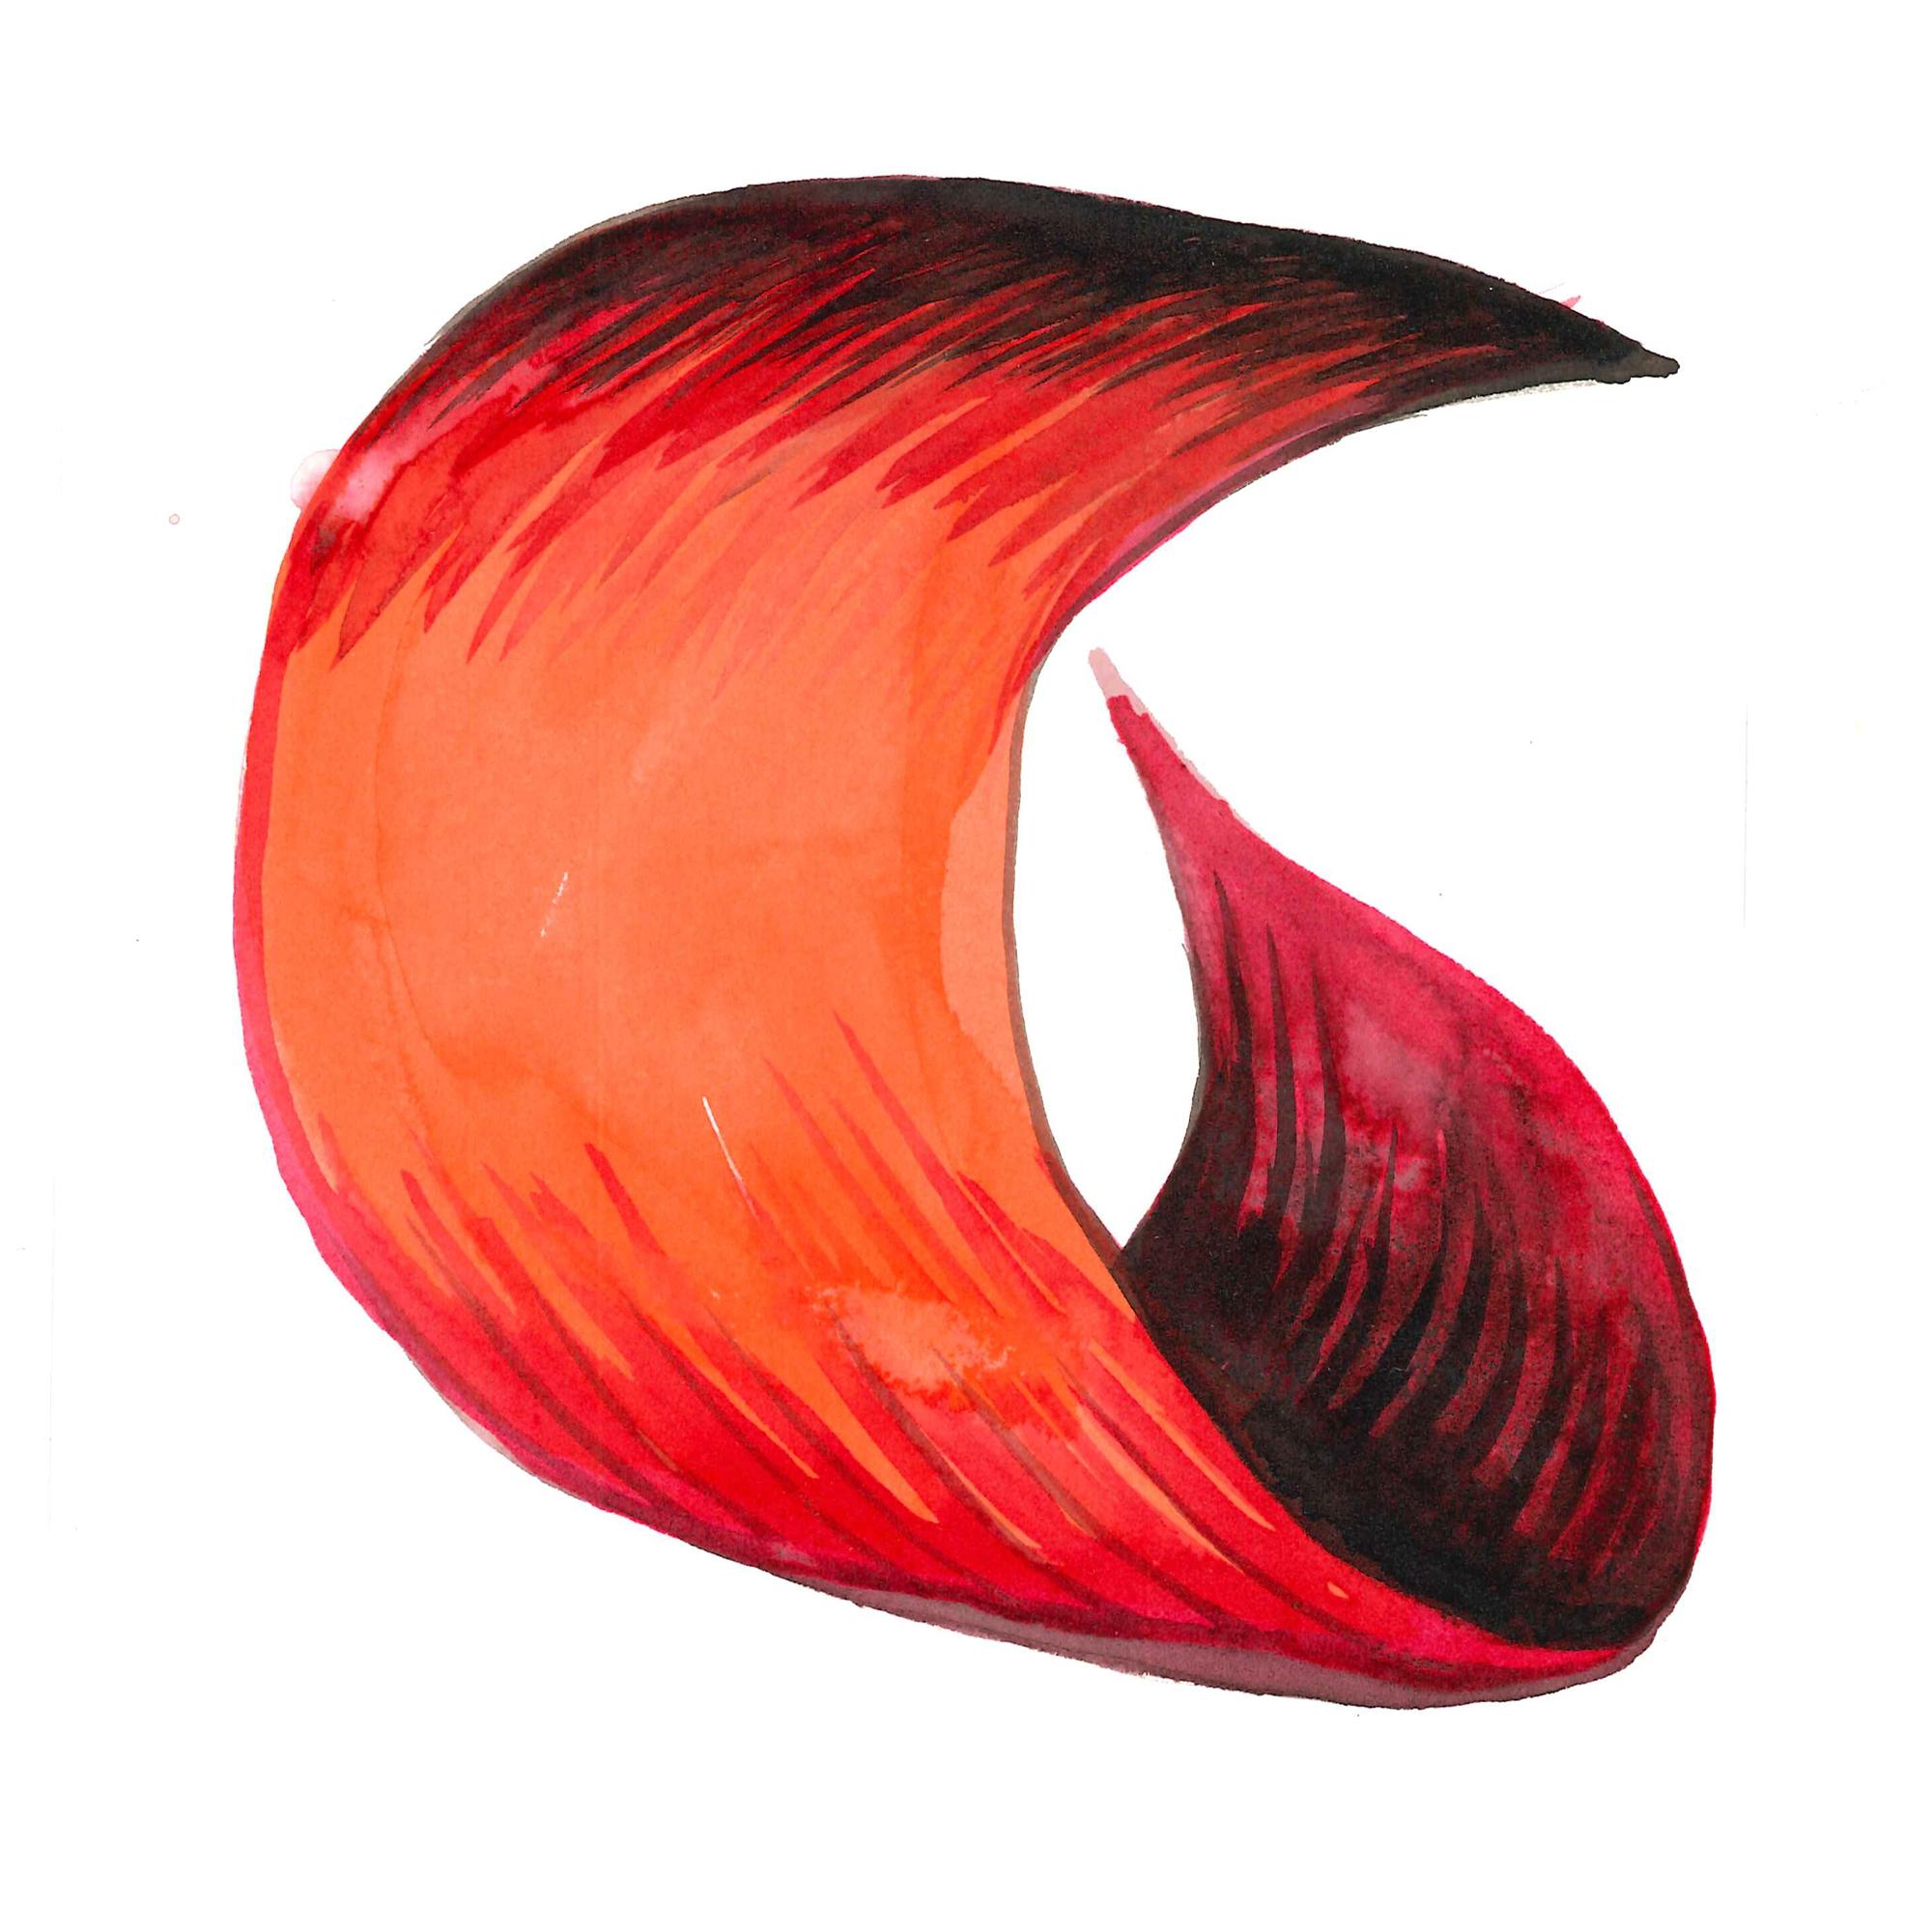 watercolour - waratah petal detail